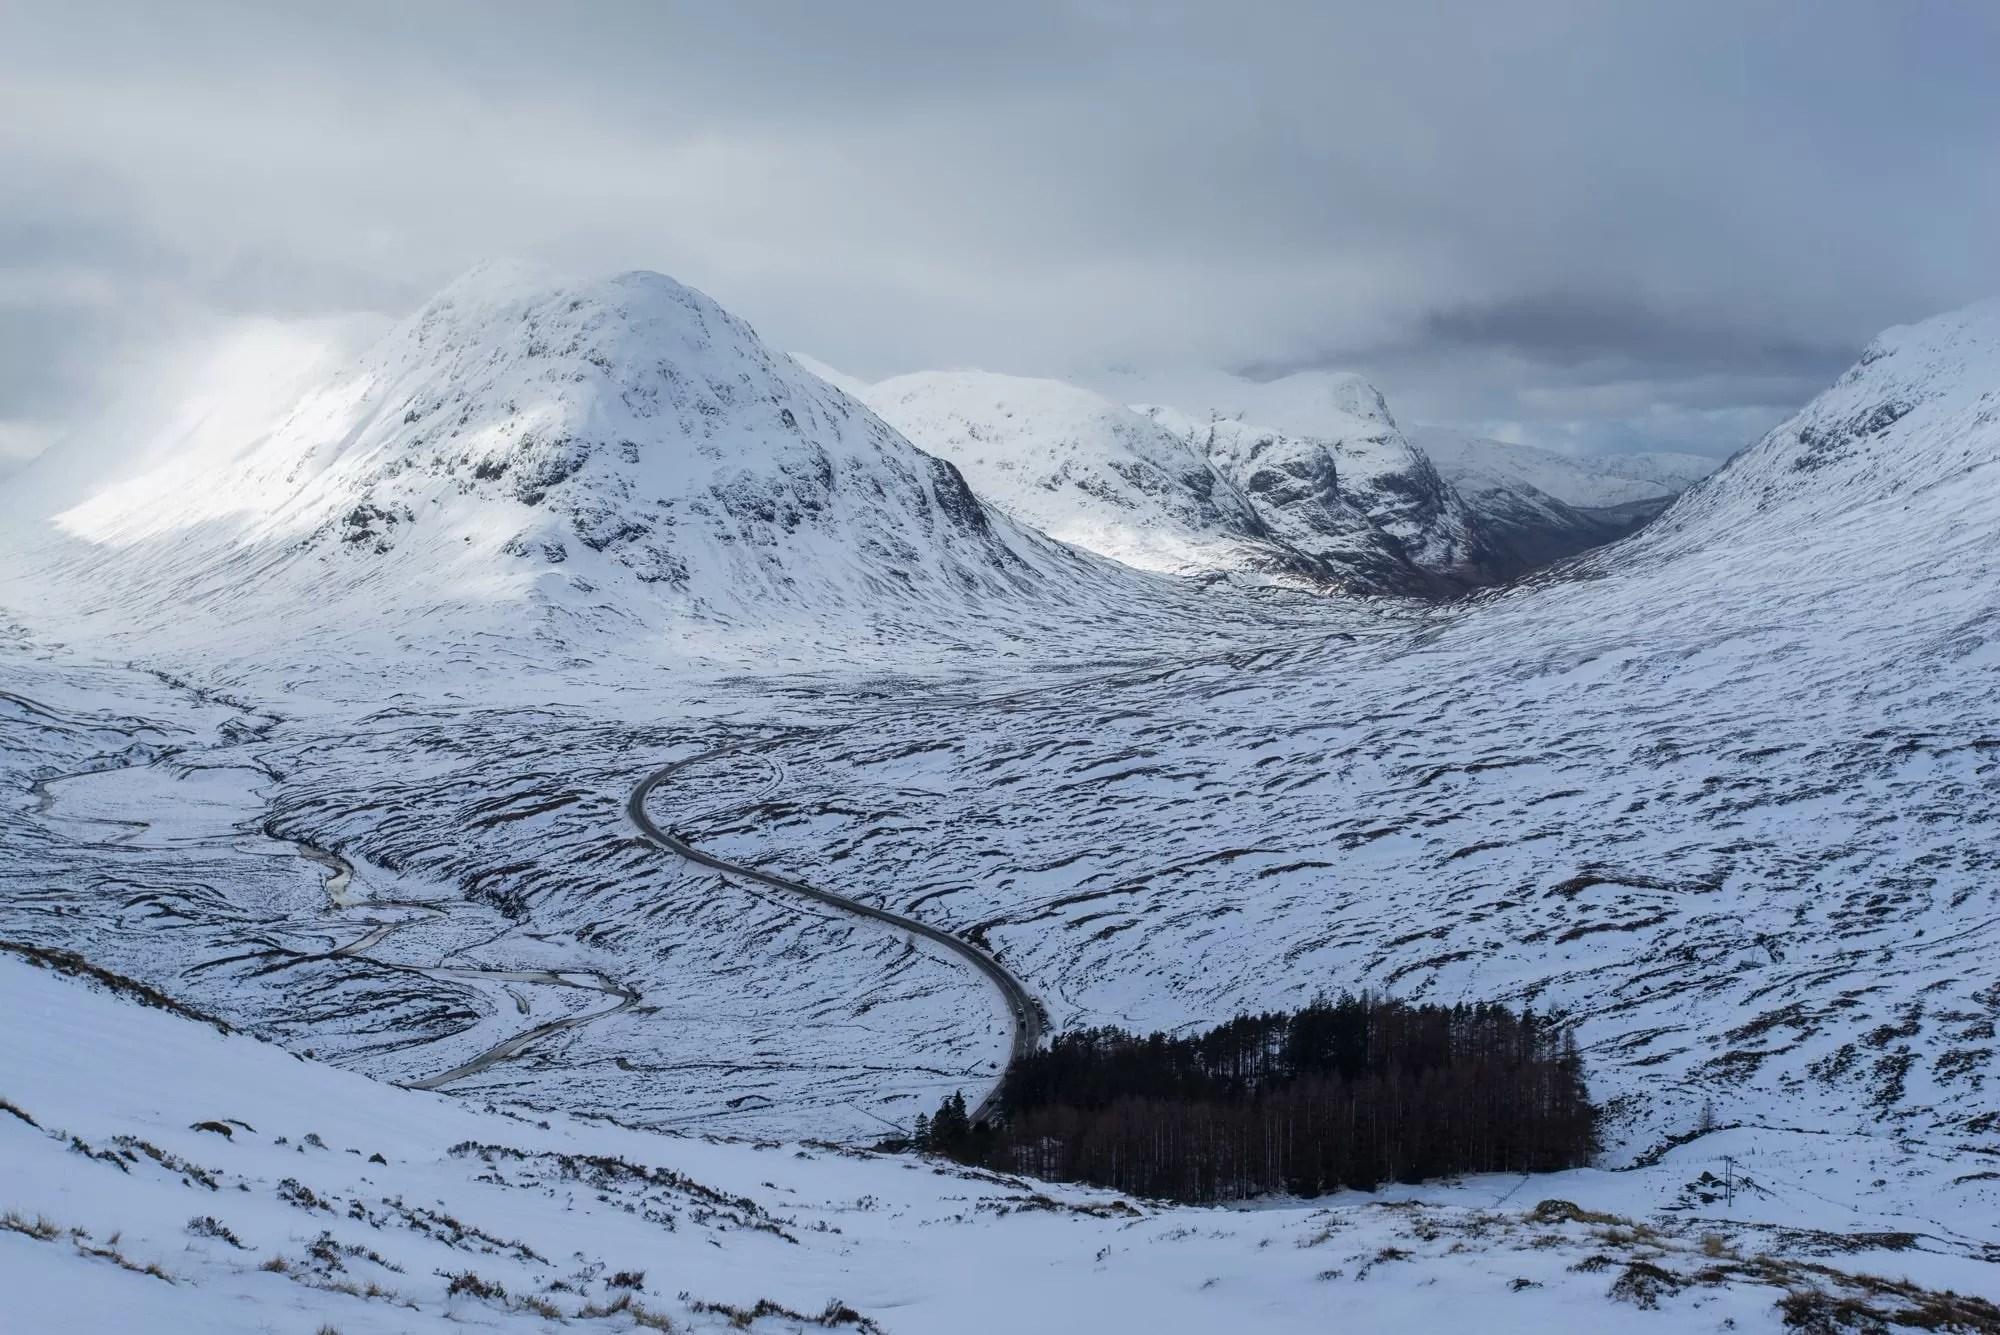 Buachille Etiv Beag from Beinn A'Chrulaiste Winter - Scotland Photography Workshops